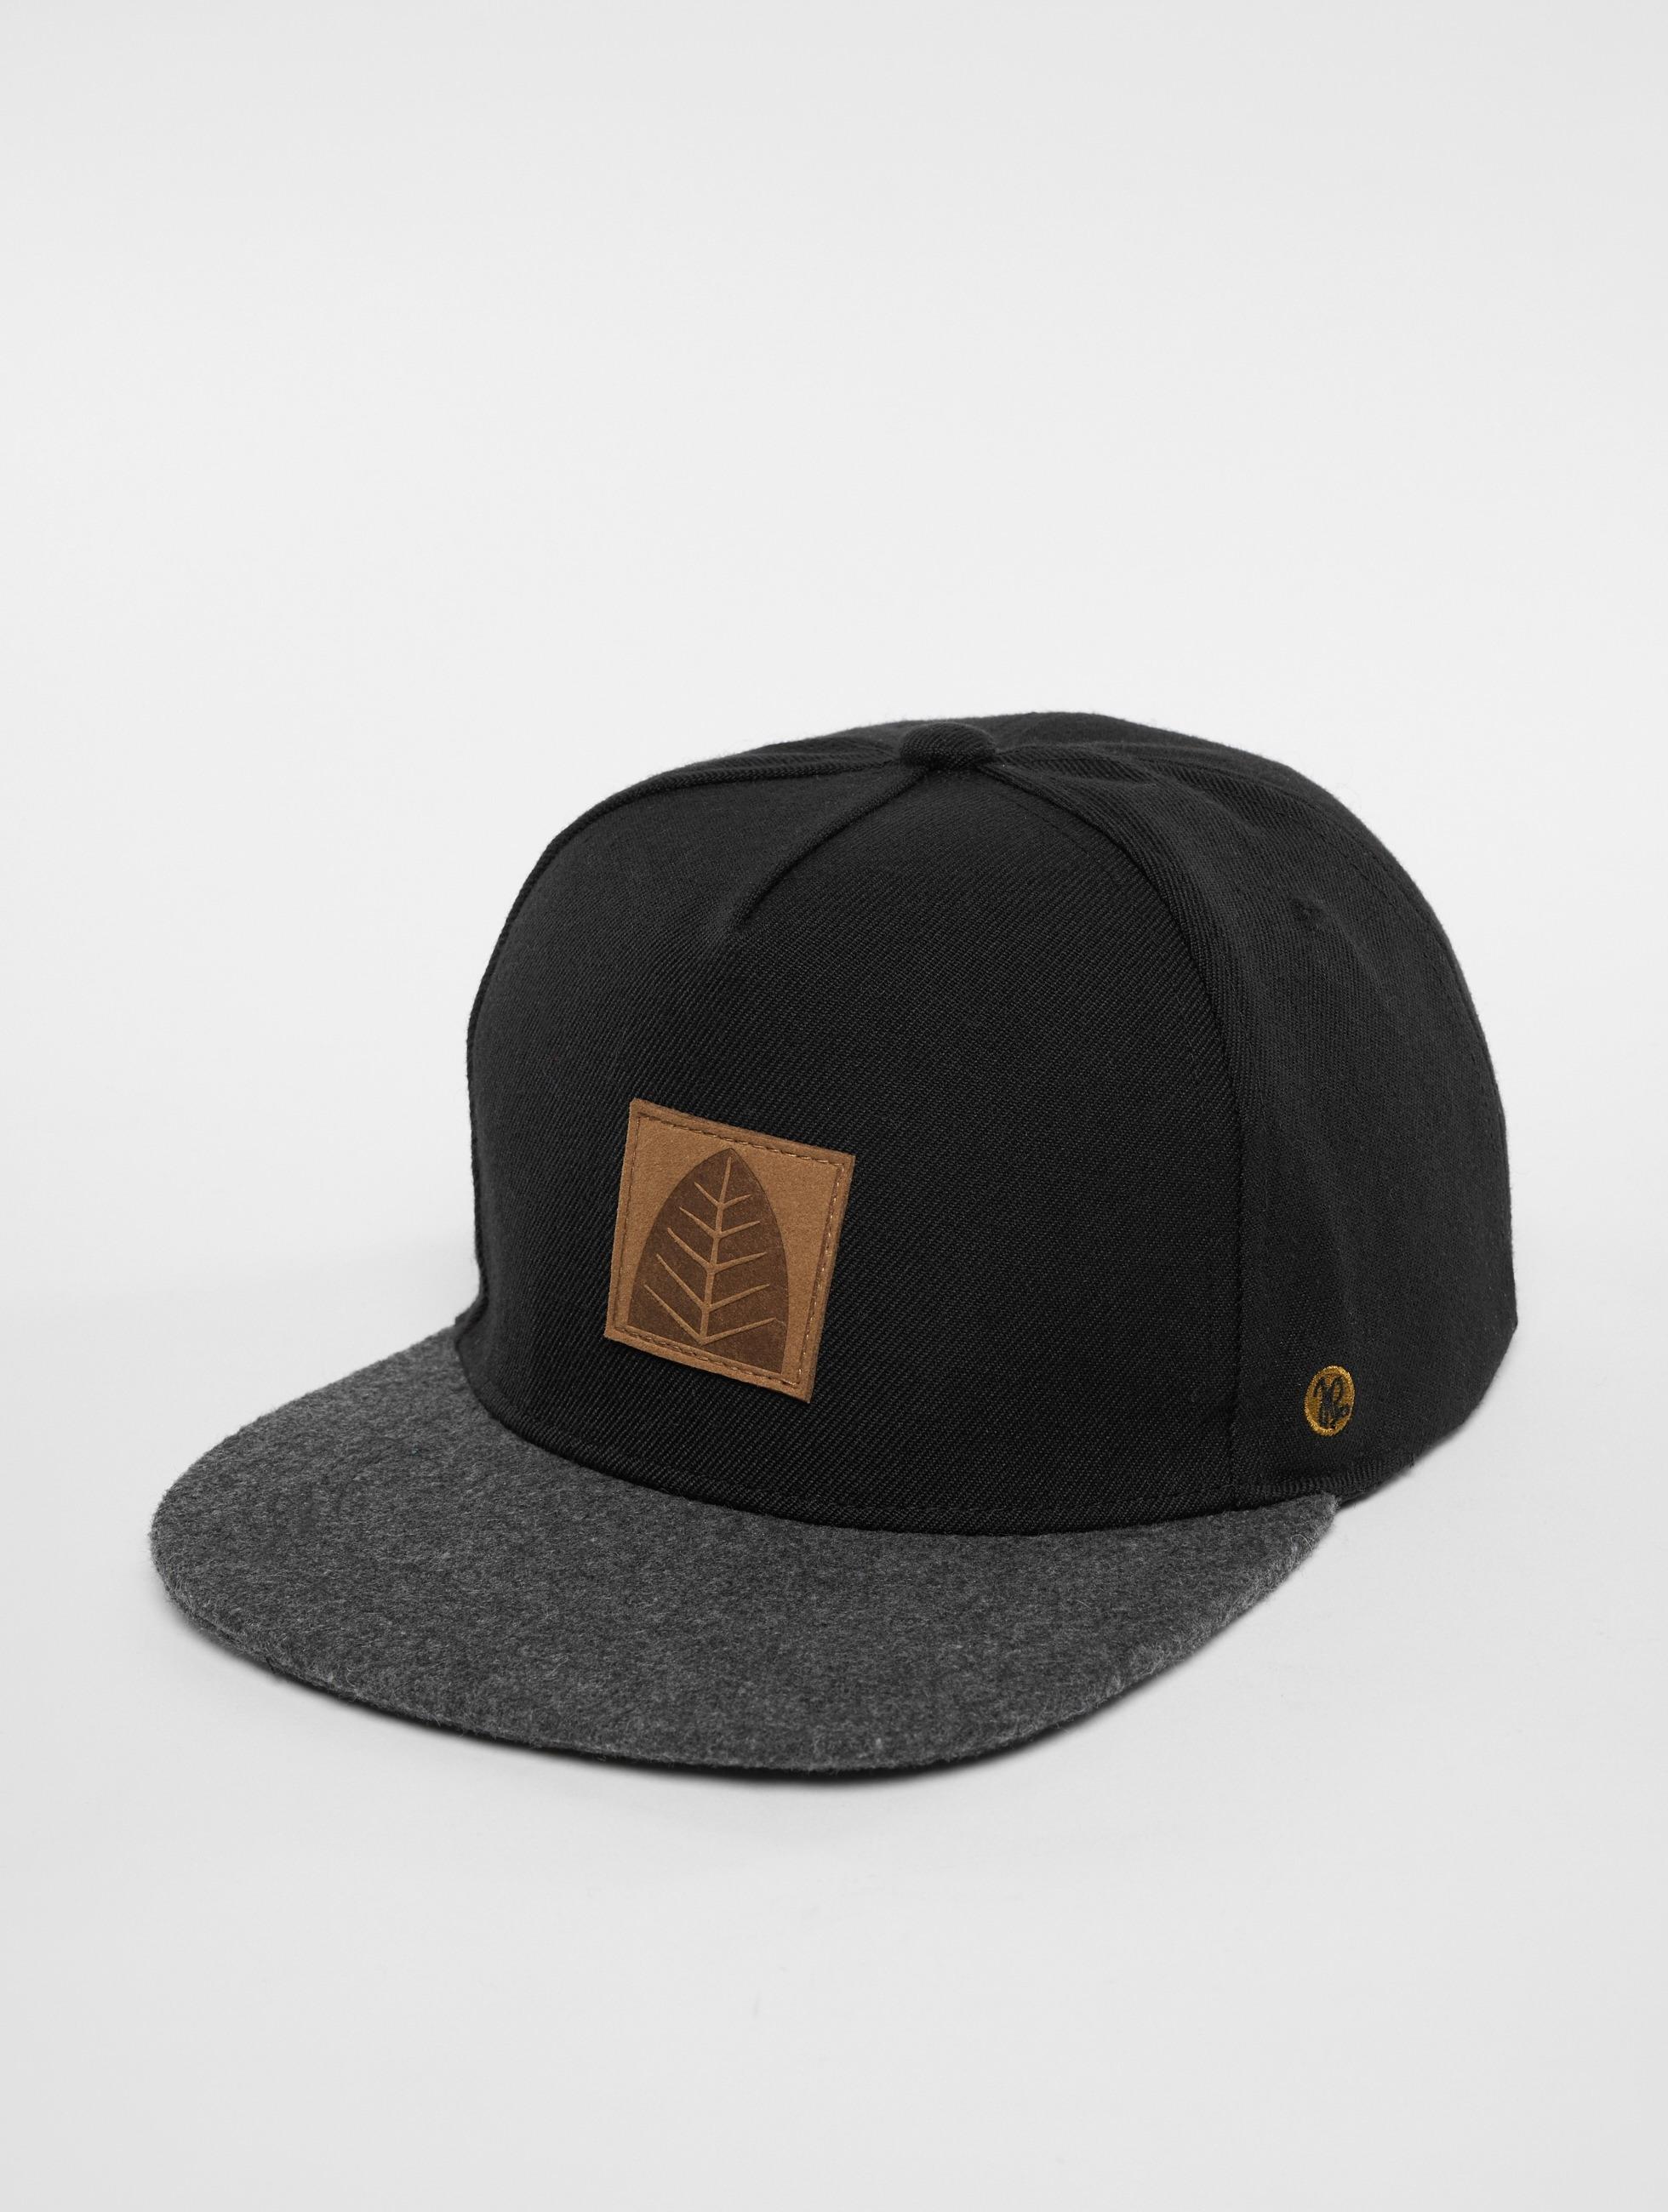 Just Rhyse / Snapback Cap La Guardia in black One Size